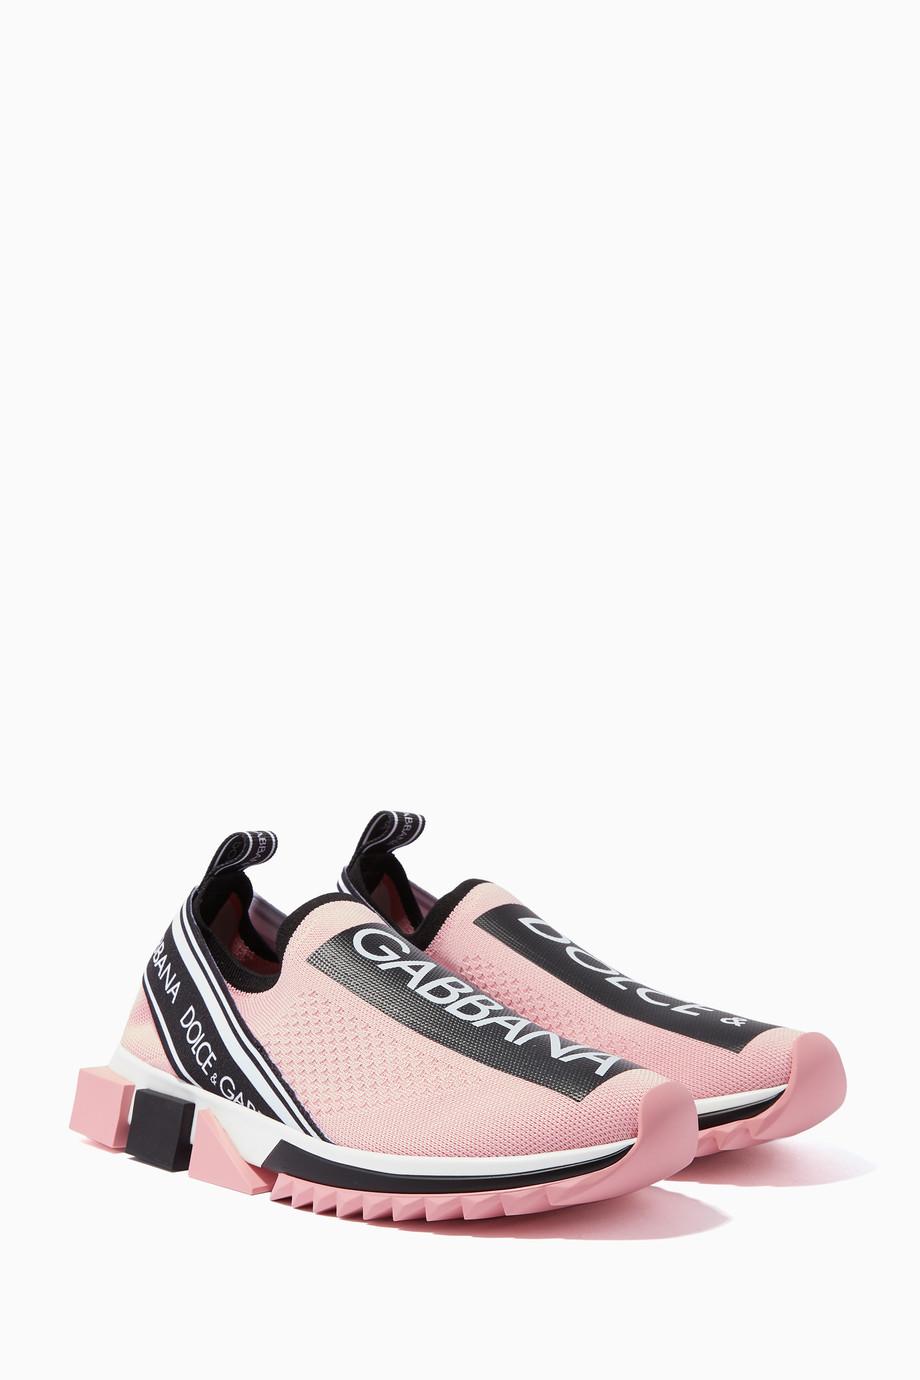 b6cadec17 تسوق حذاء سنيكرز سورينتو وردي Dolce & Gabbana وردي للنساء | اُناس ...